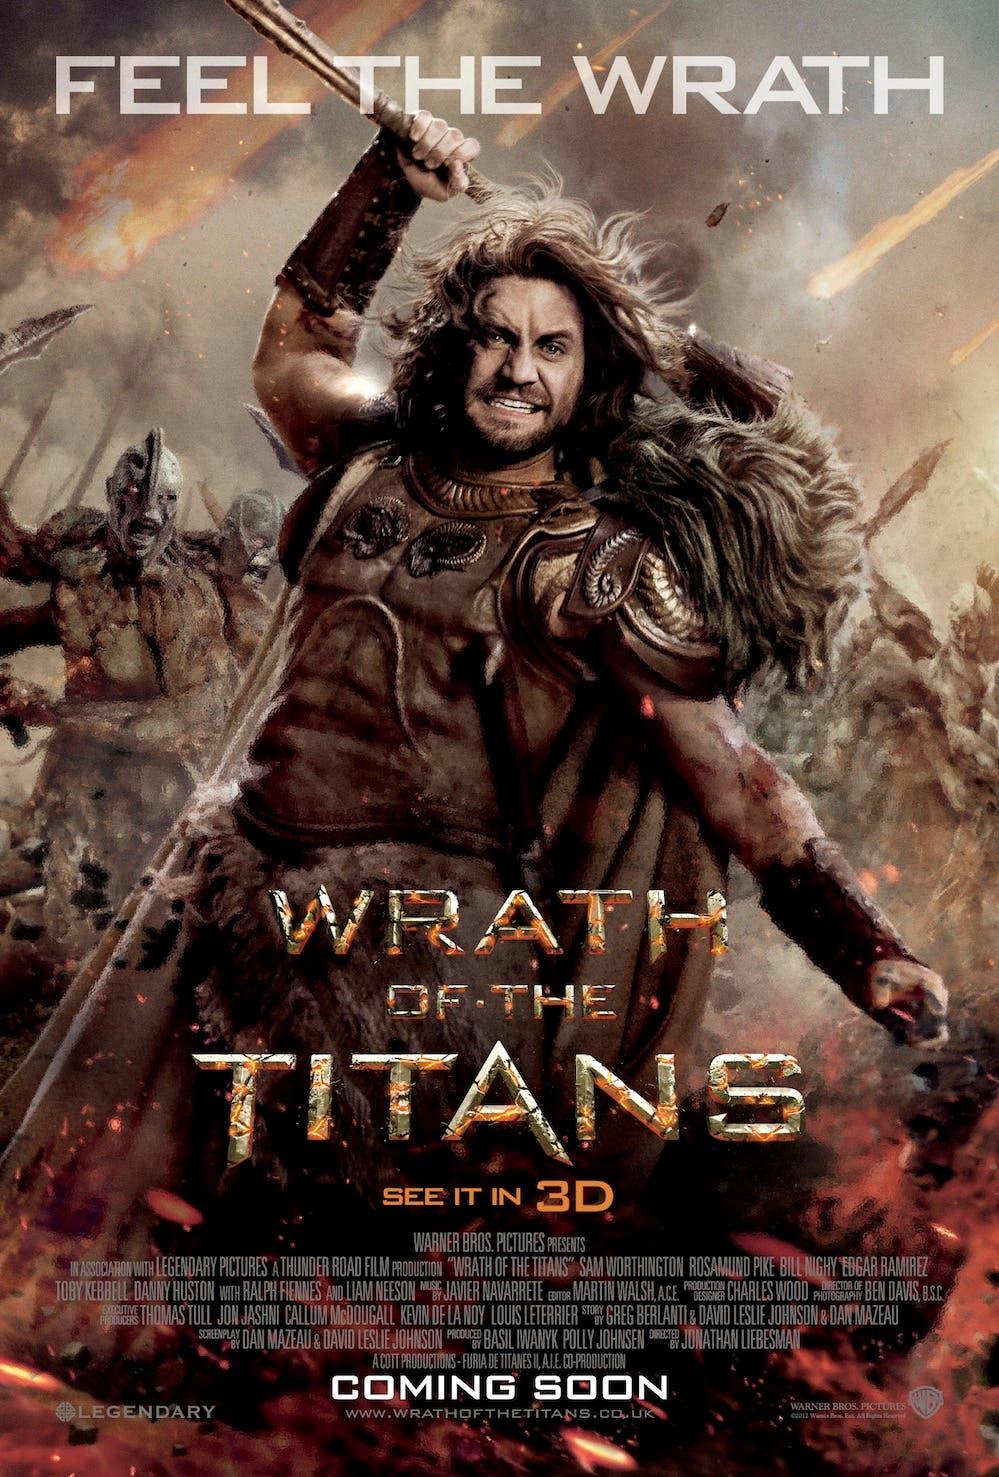 Ira de Titanes (Wrath of the Titans): Featurette de Quimera